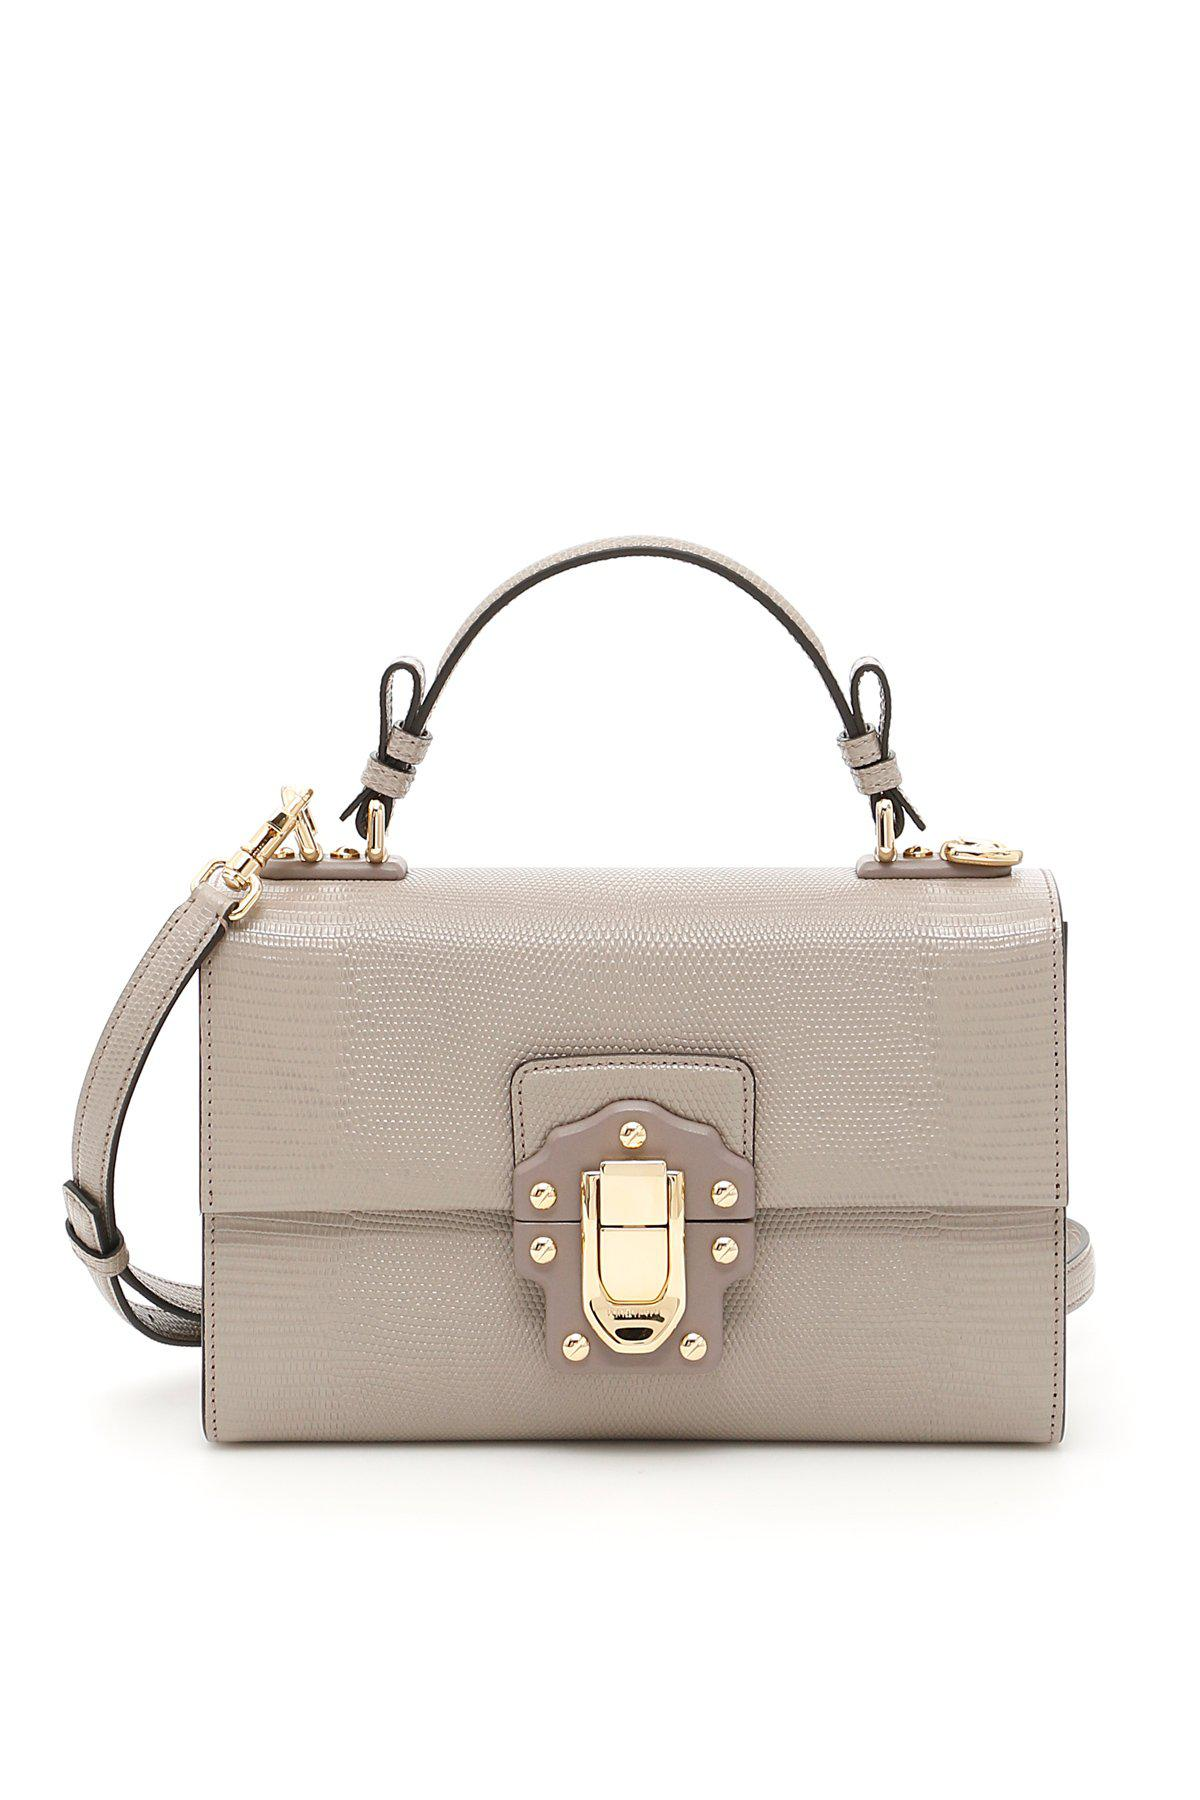 a7cfcbdab035 Lyst - Dolce   Gabbana Lucia Tote Bag in Natural